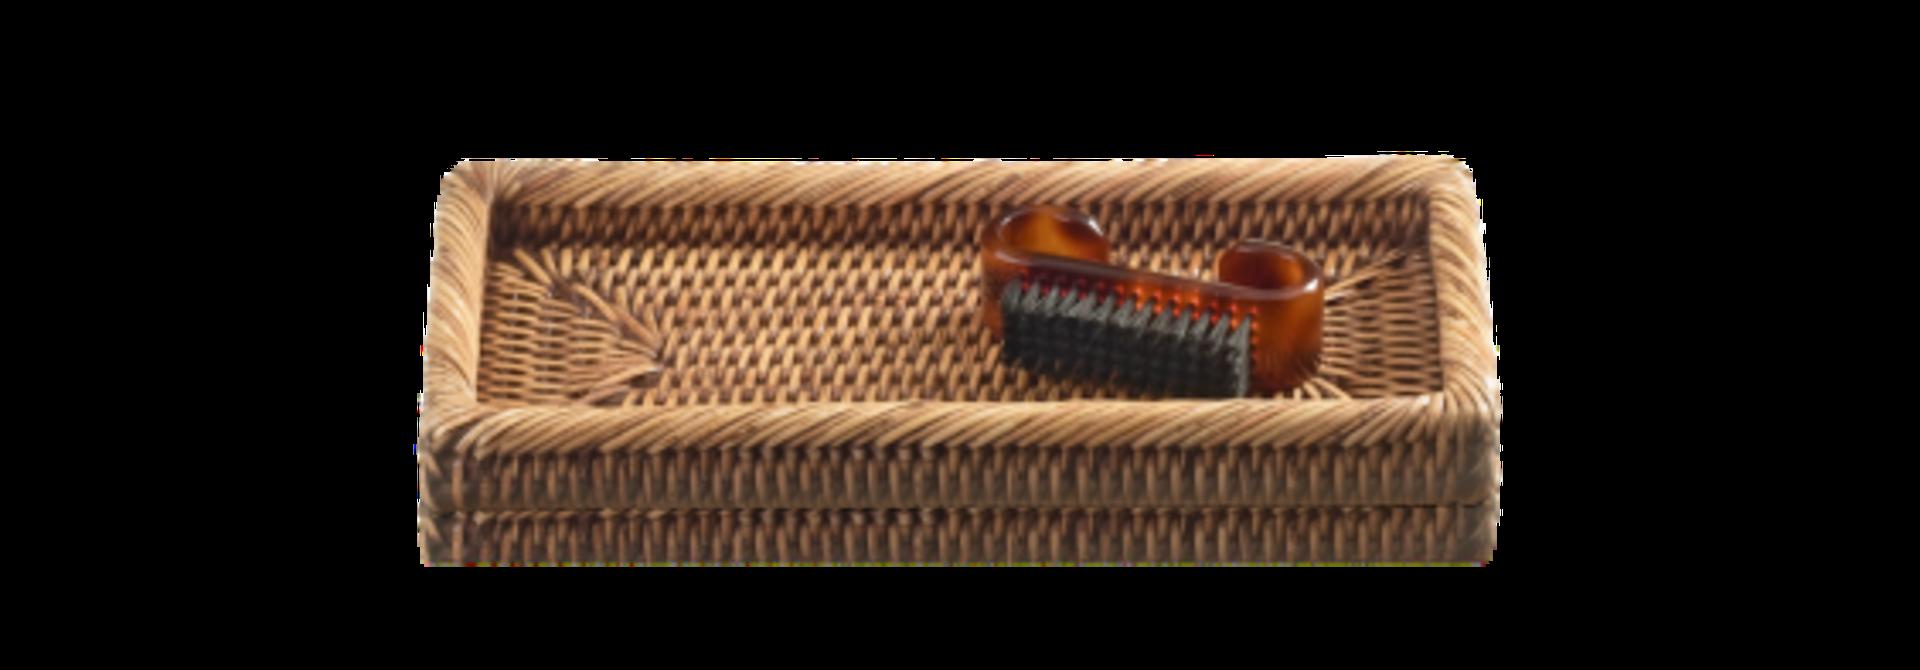 PAGAN - Small Rattan Tray 21x7x3cm